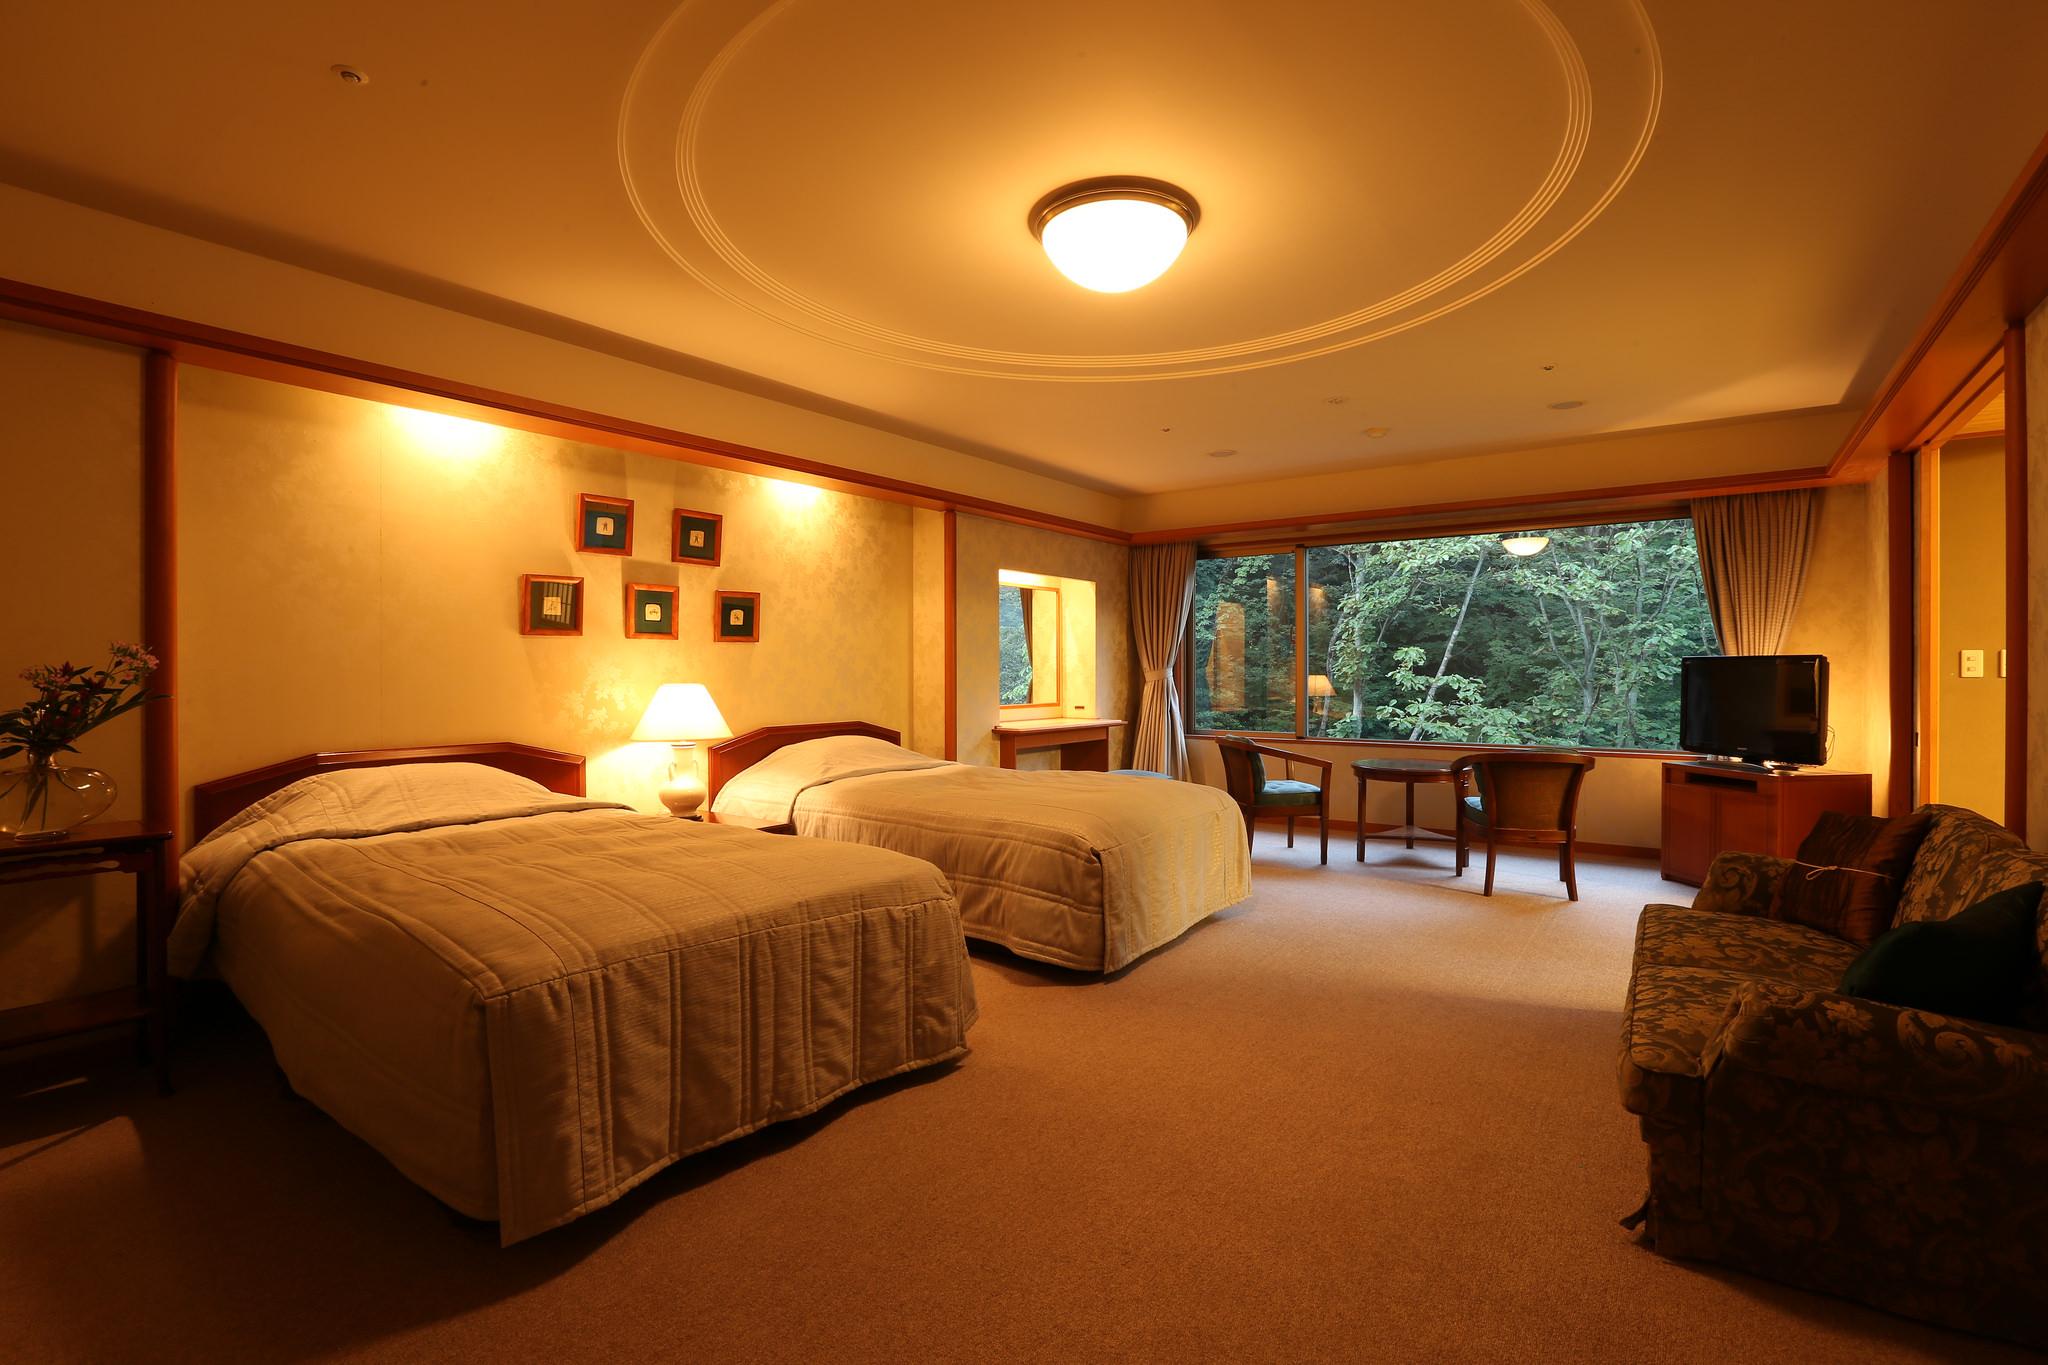 Japanese and Western style Hybrid Hotel Room at Nishimuraya Hotel Shogetsutei - Kinosaki Onsen, Japan